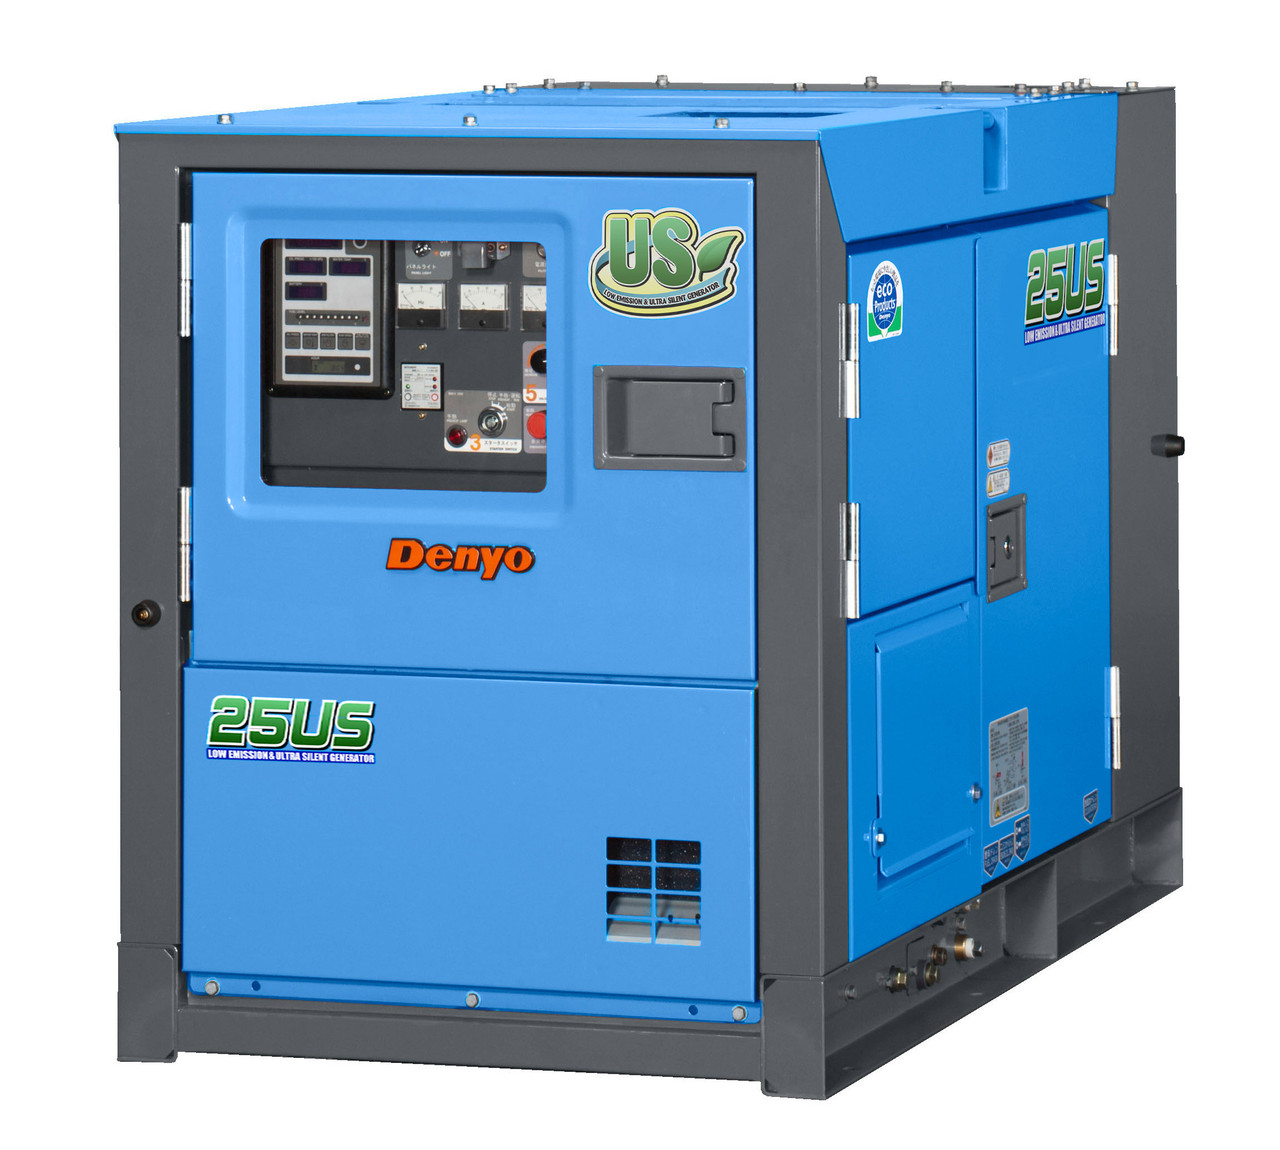 DENYO 25KVA Diesel Generator - 3 Phase - G600160 - Ultra Silenced